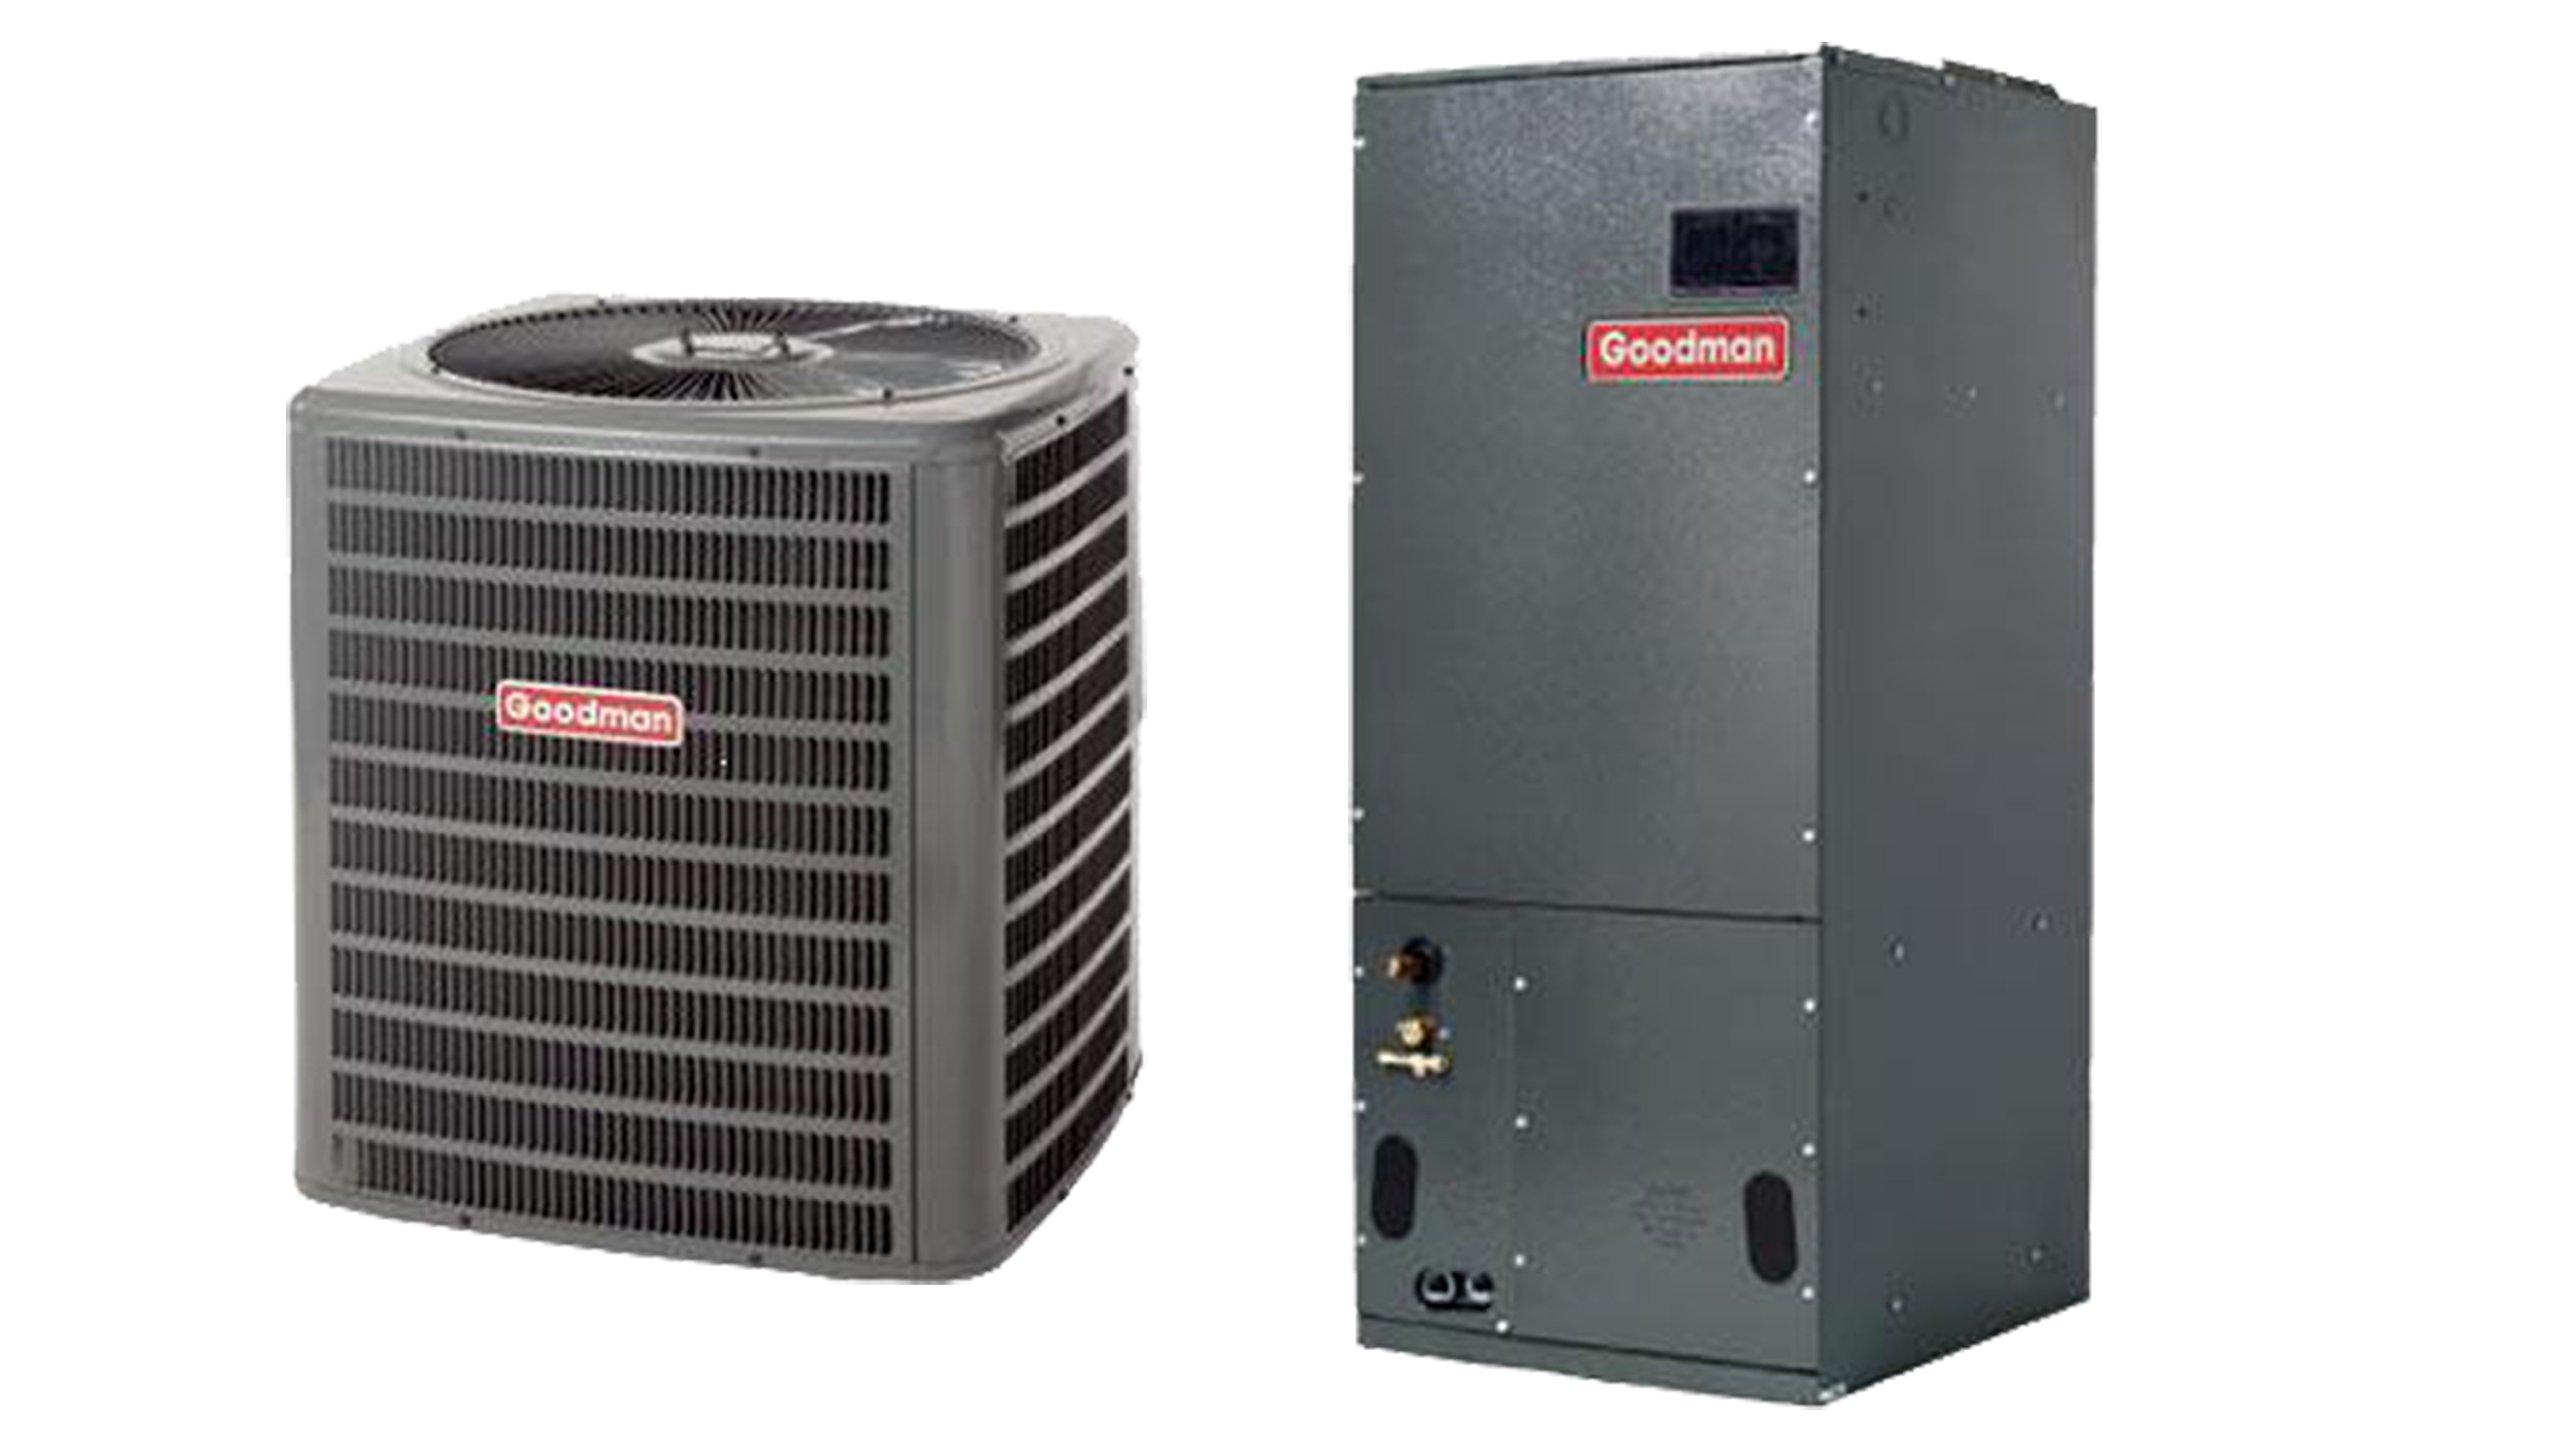 Goodman 1.5 Ton 14 SEER Heat Pump System with Multi-Position Air Handler GSZ140181 ARUF25B14